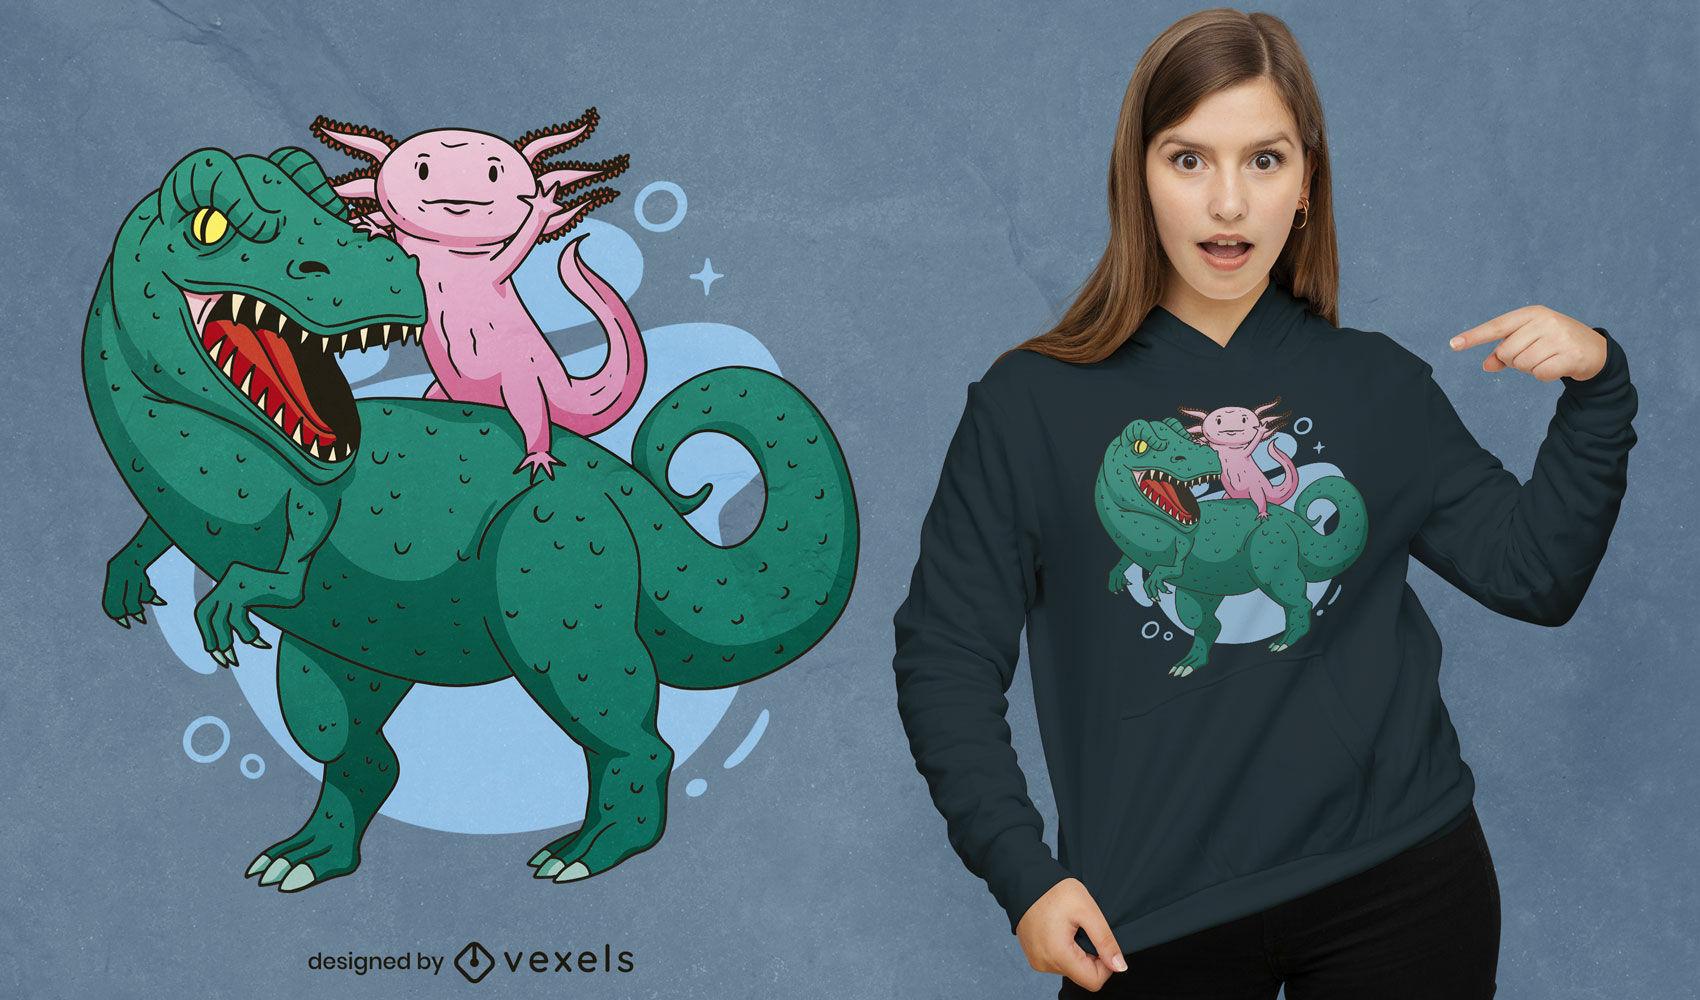 Cool axolotl and t-rex t-shirt design